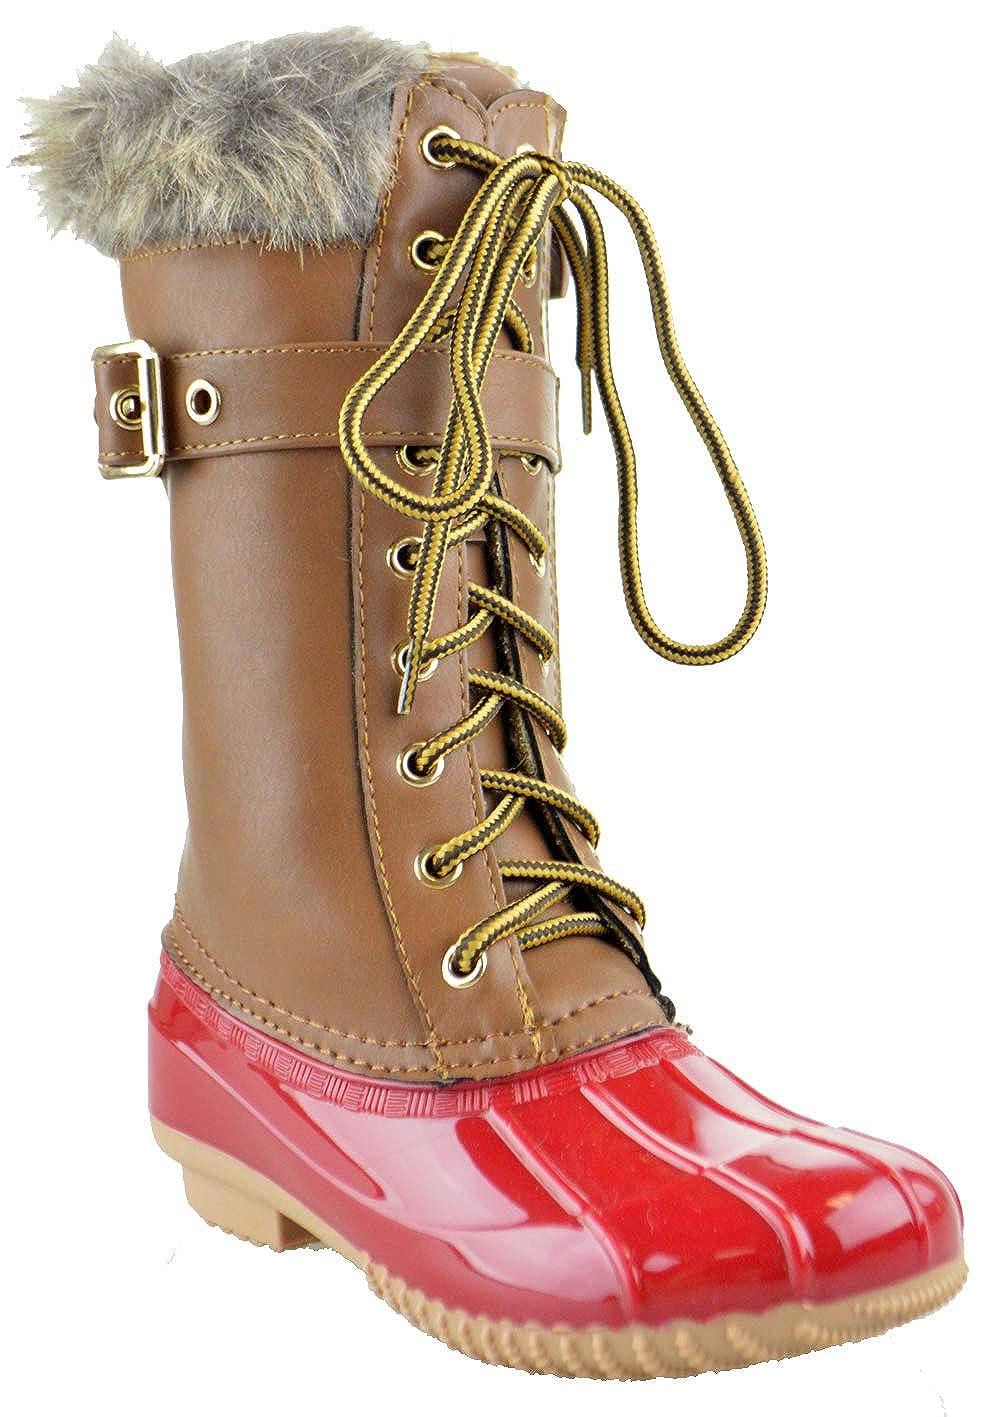 Link Duck 10K Little Girls Knee High Rain Lace Up Fur Trendy Rubber Duck Boots